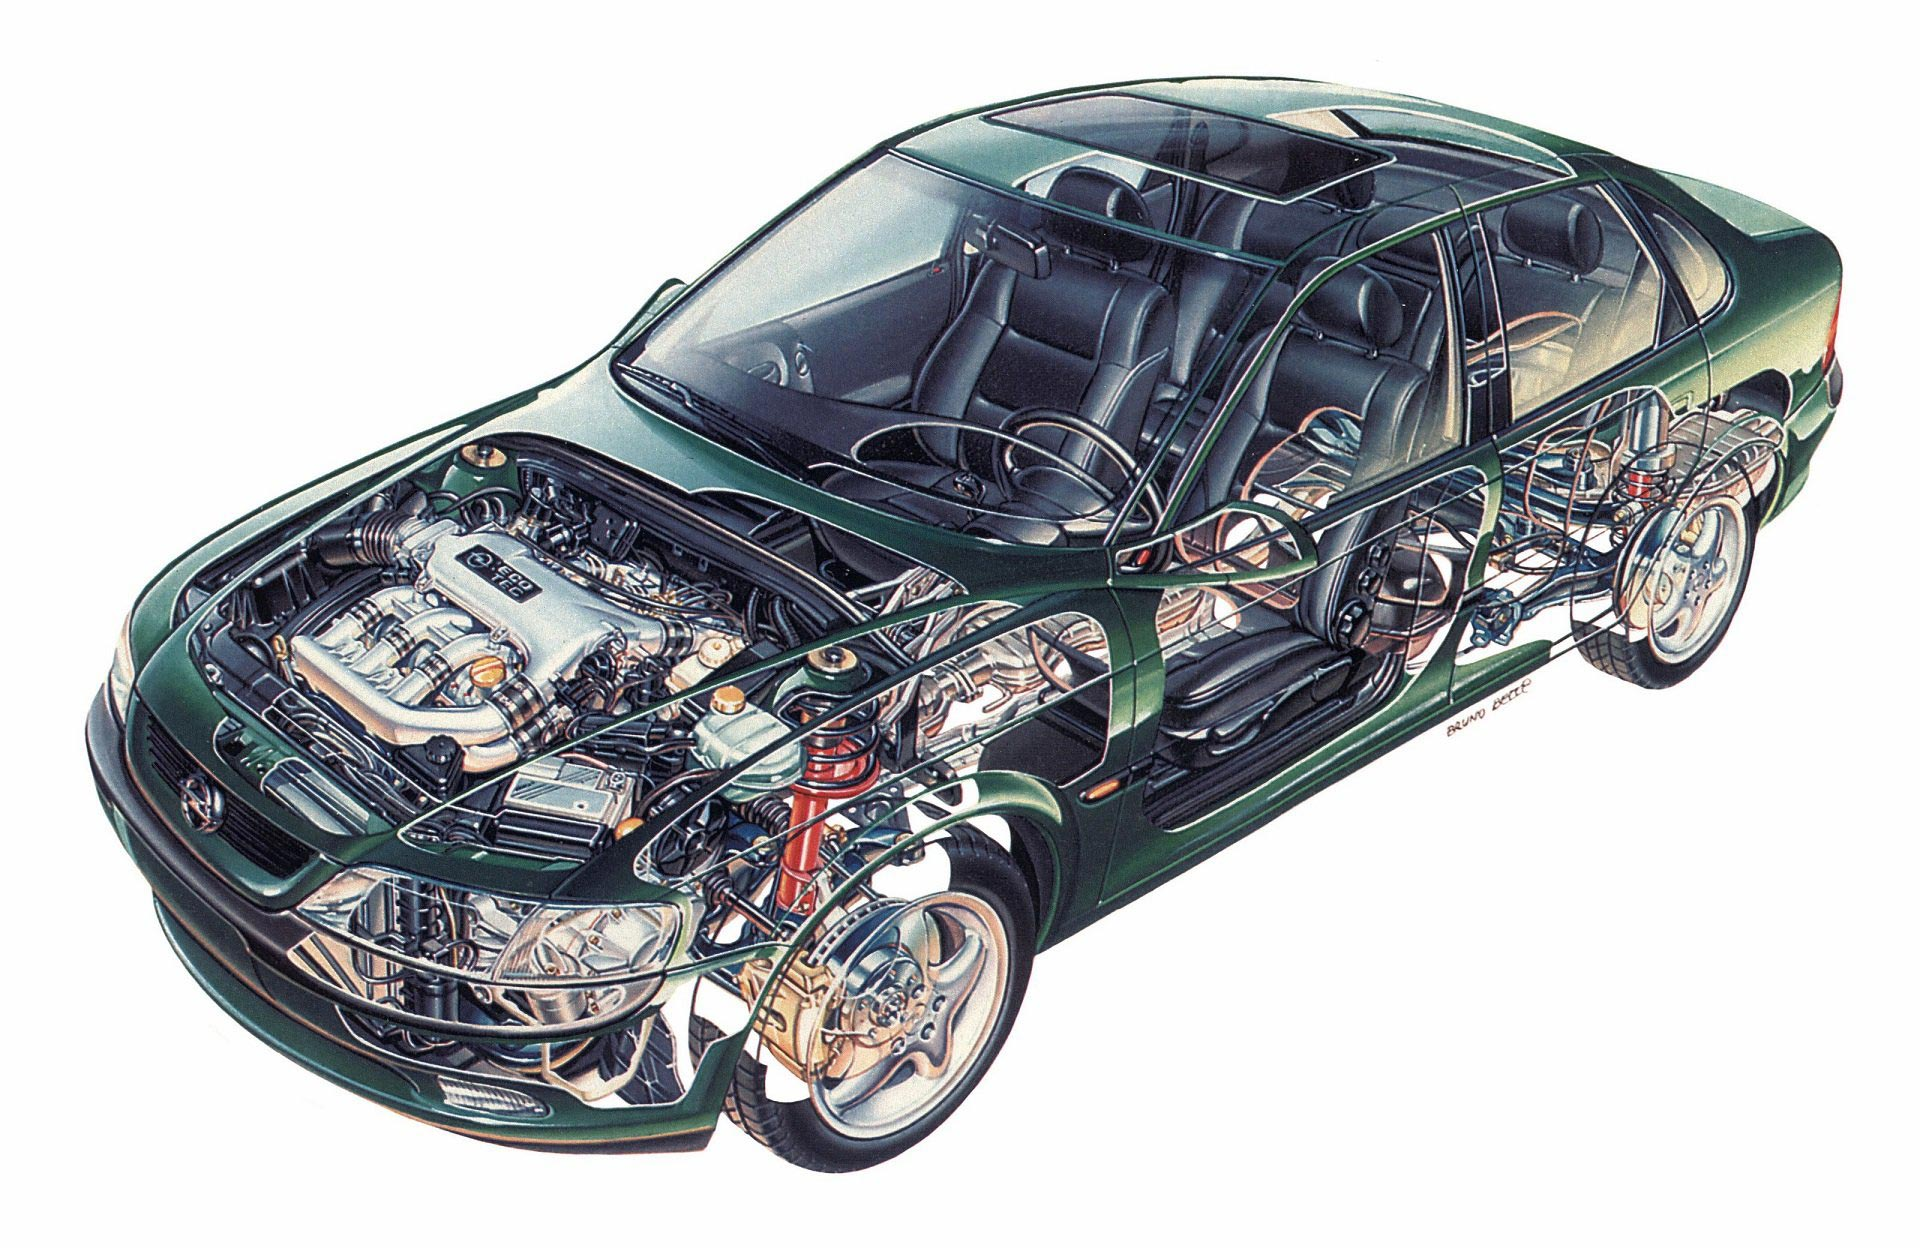 Opel Vectra cutaway